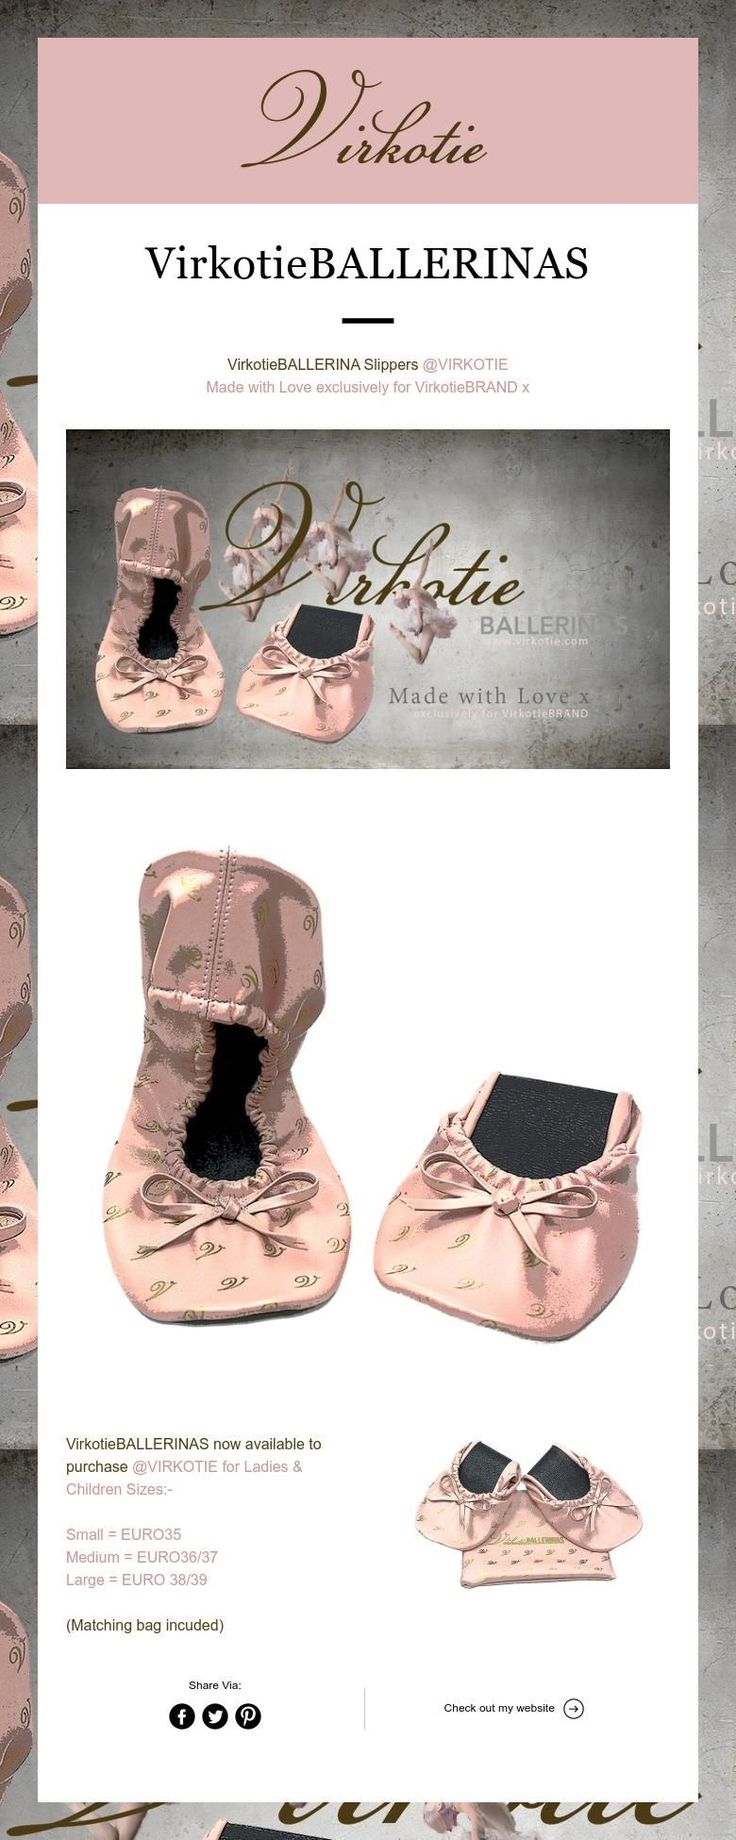 VIRKOTIE Ballerinas ... Stylish Slippers for tired feet!